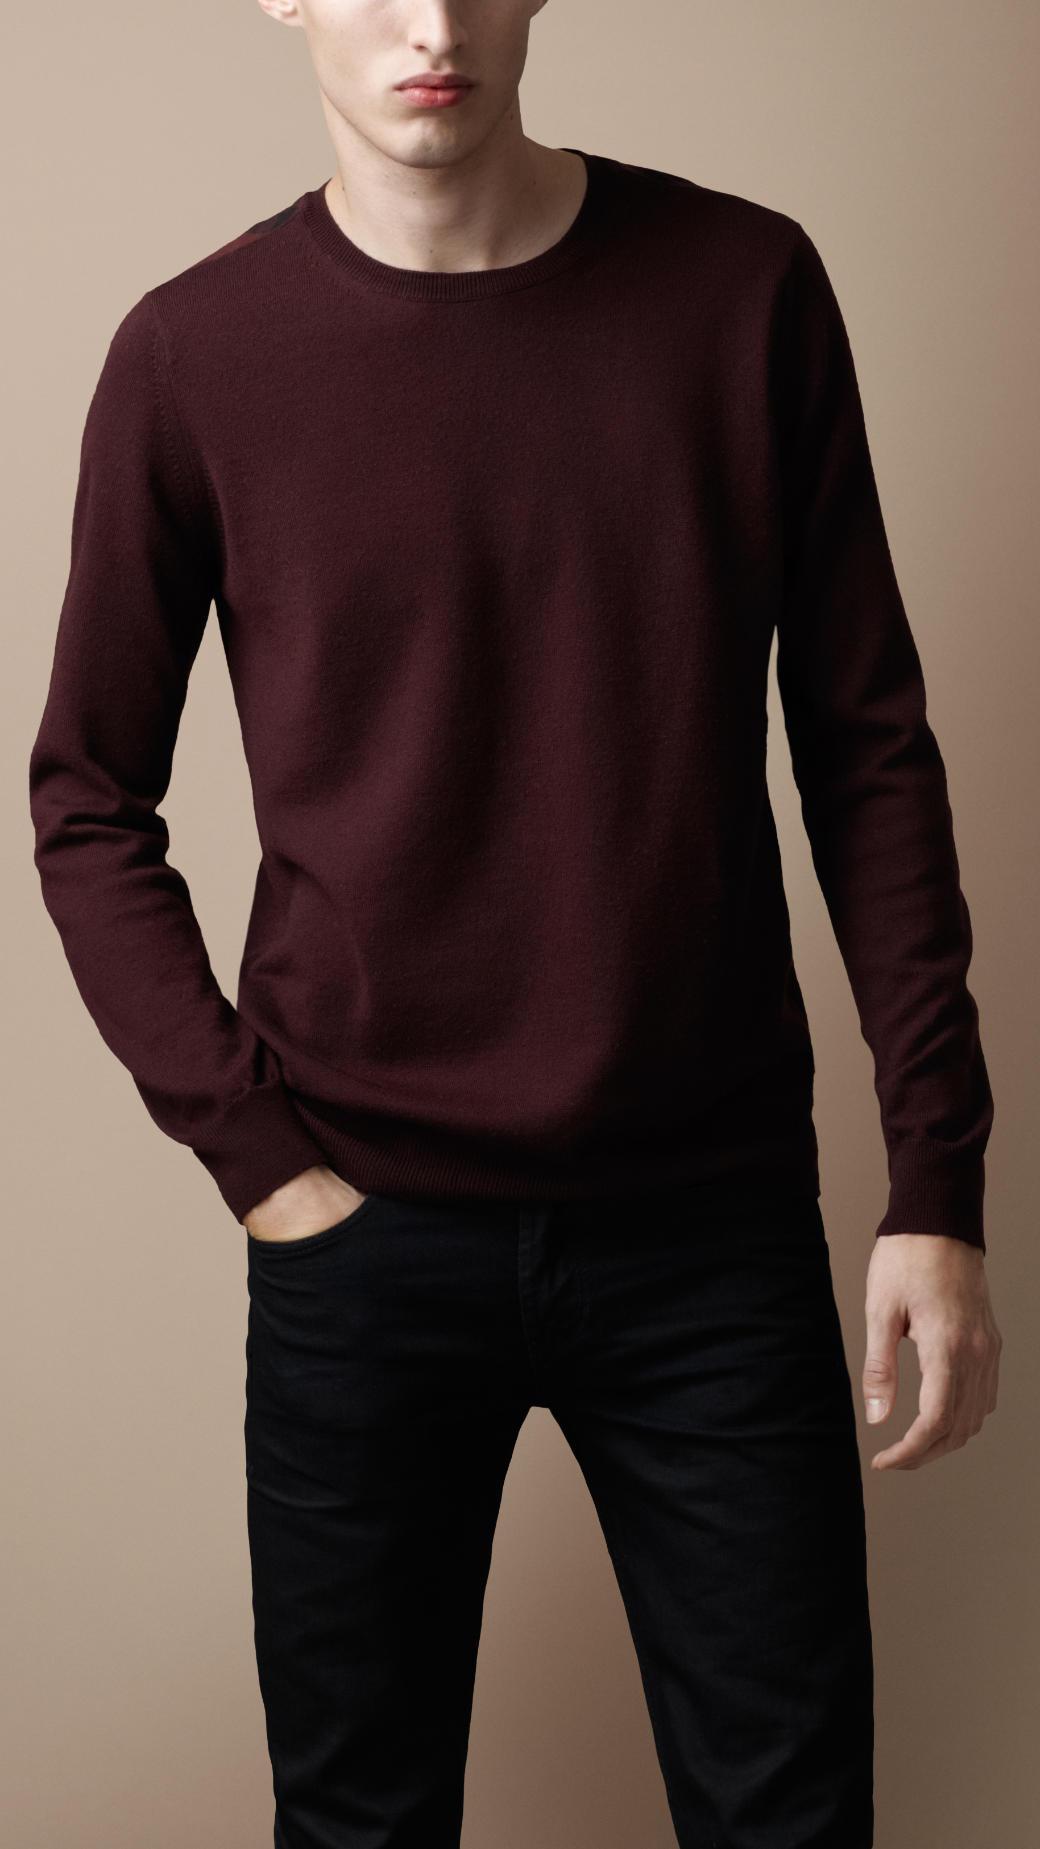 337b71bac Lyst - Burberry Brit Merino Wool Sweater in Brown for Men